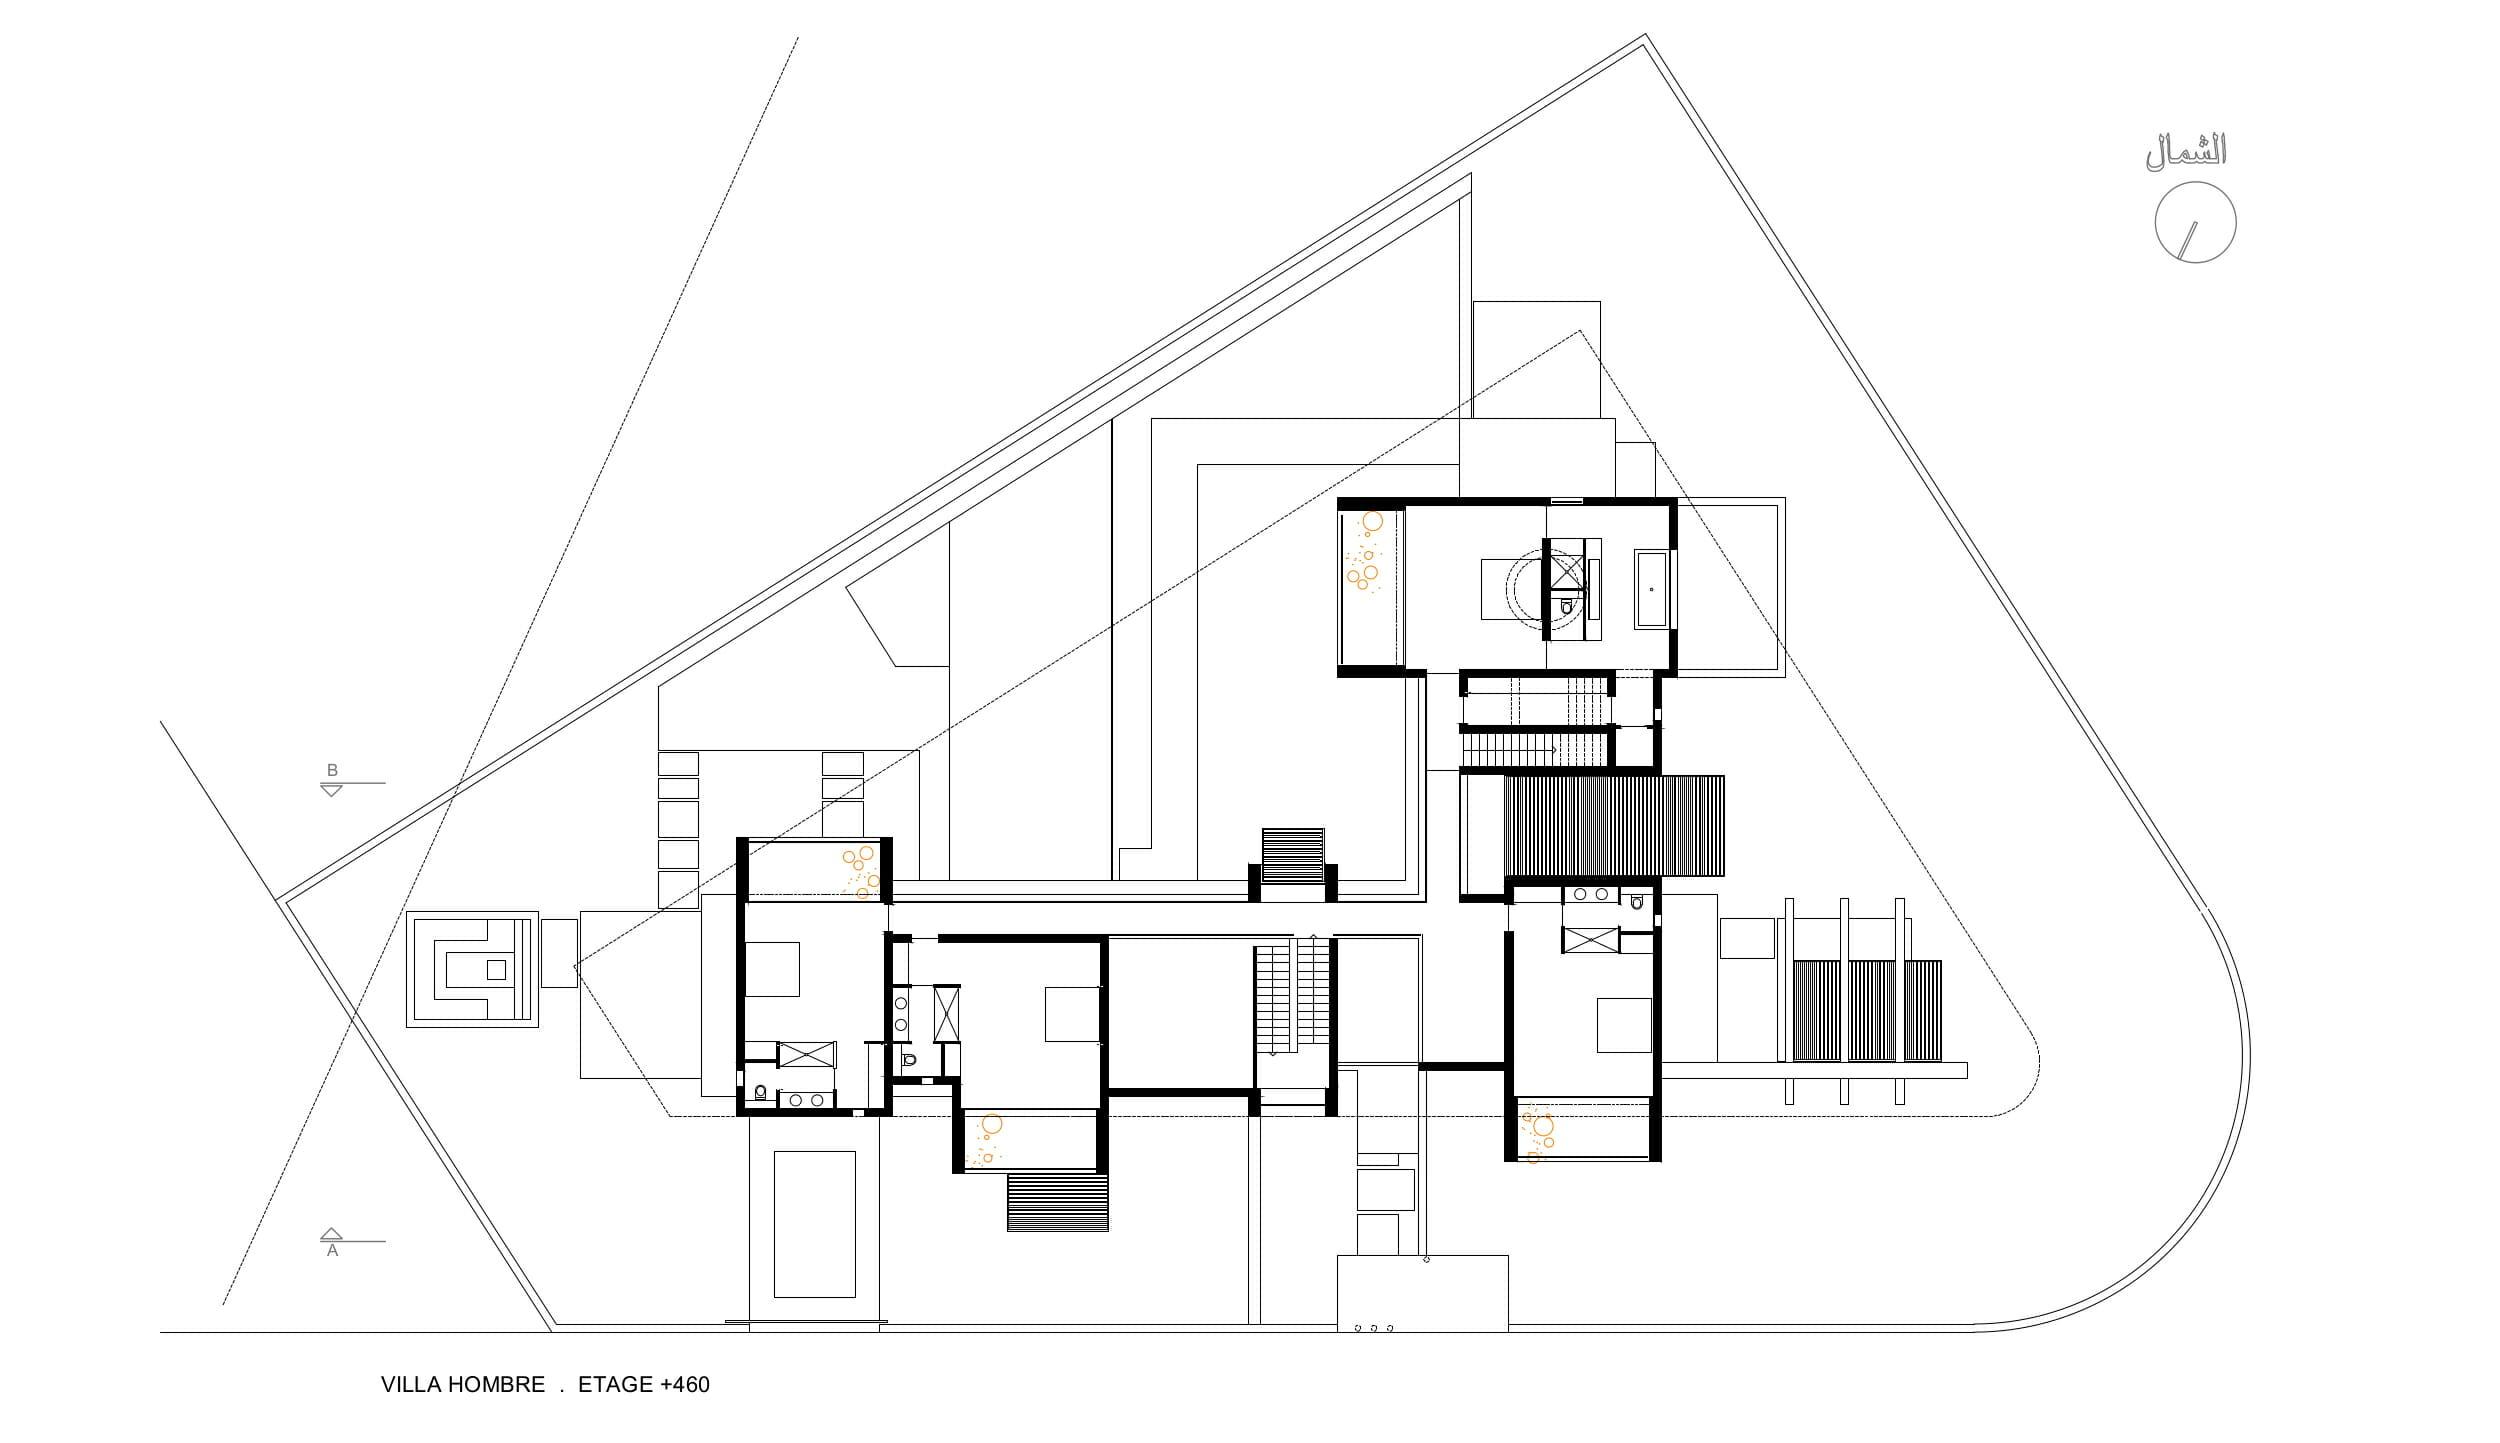 HOMBRE.plan 02-etage